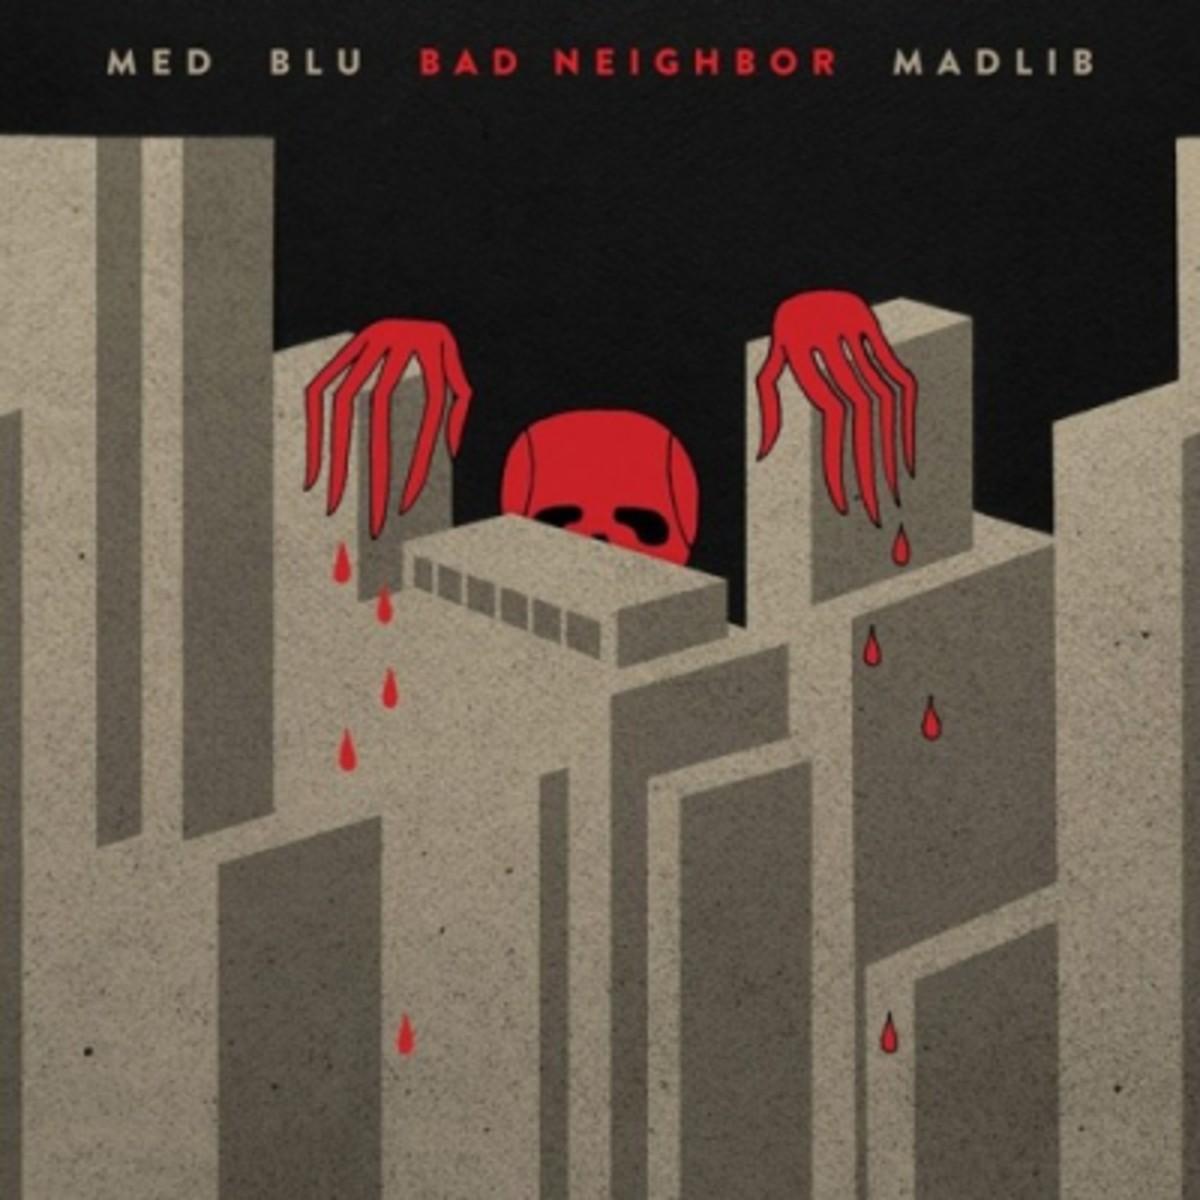 med-blu-madlib-bad-neighbor.jpg